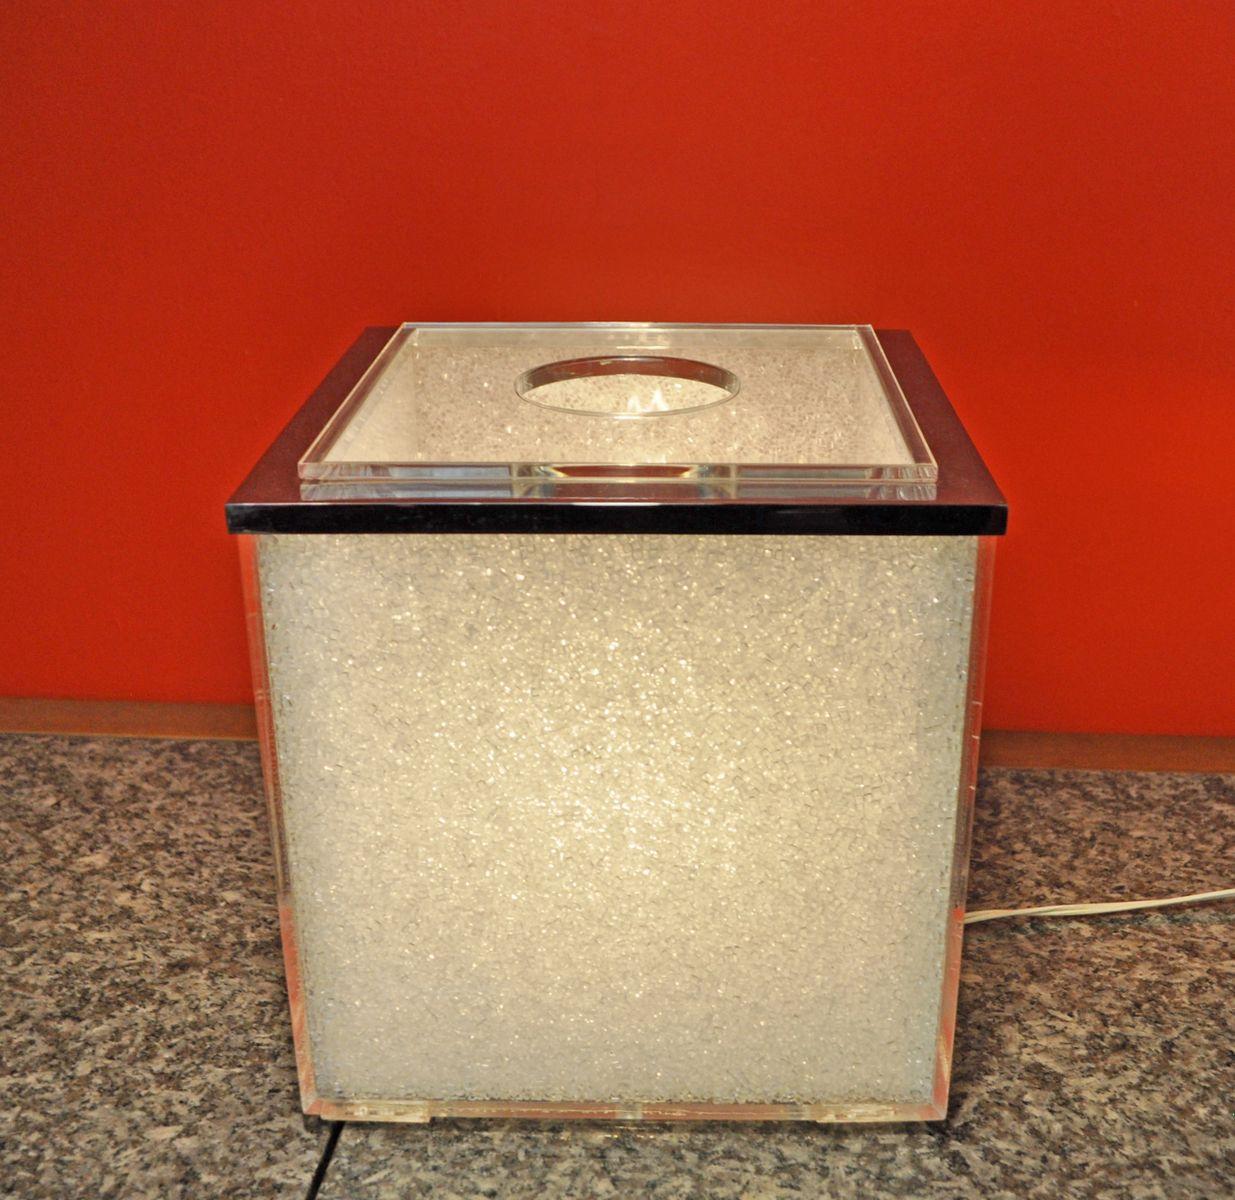 Würfelförmige Tischlampe, 1970er